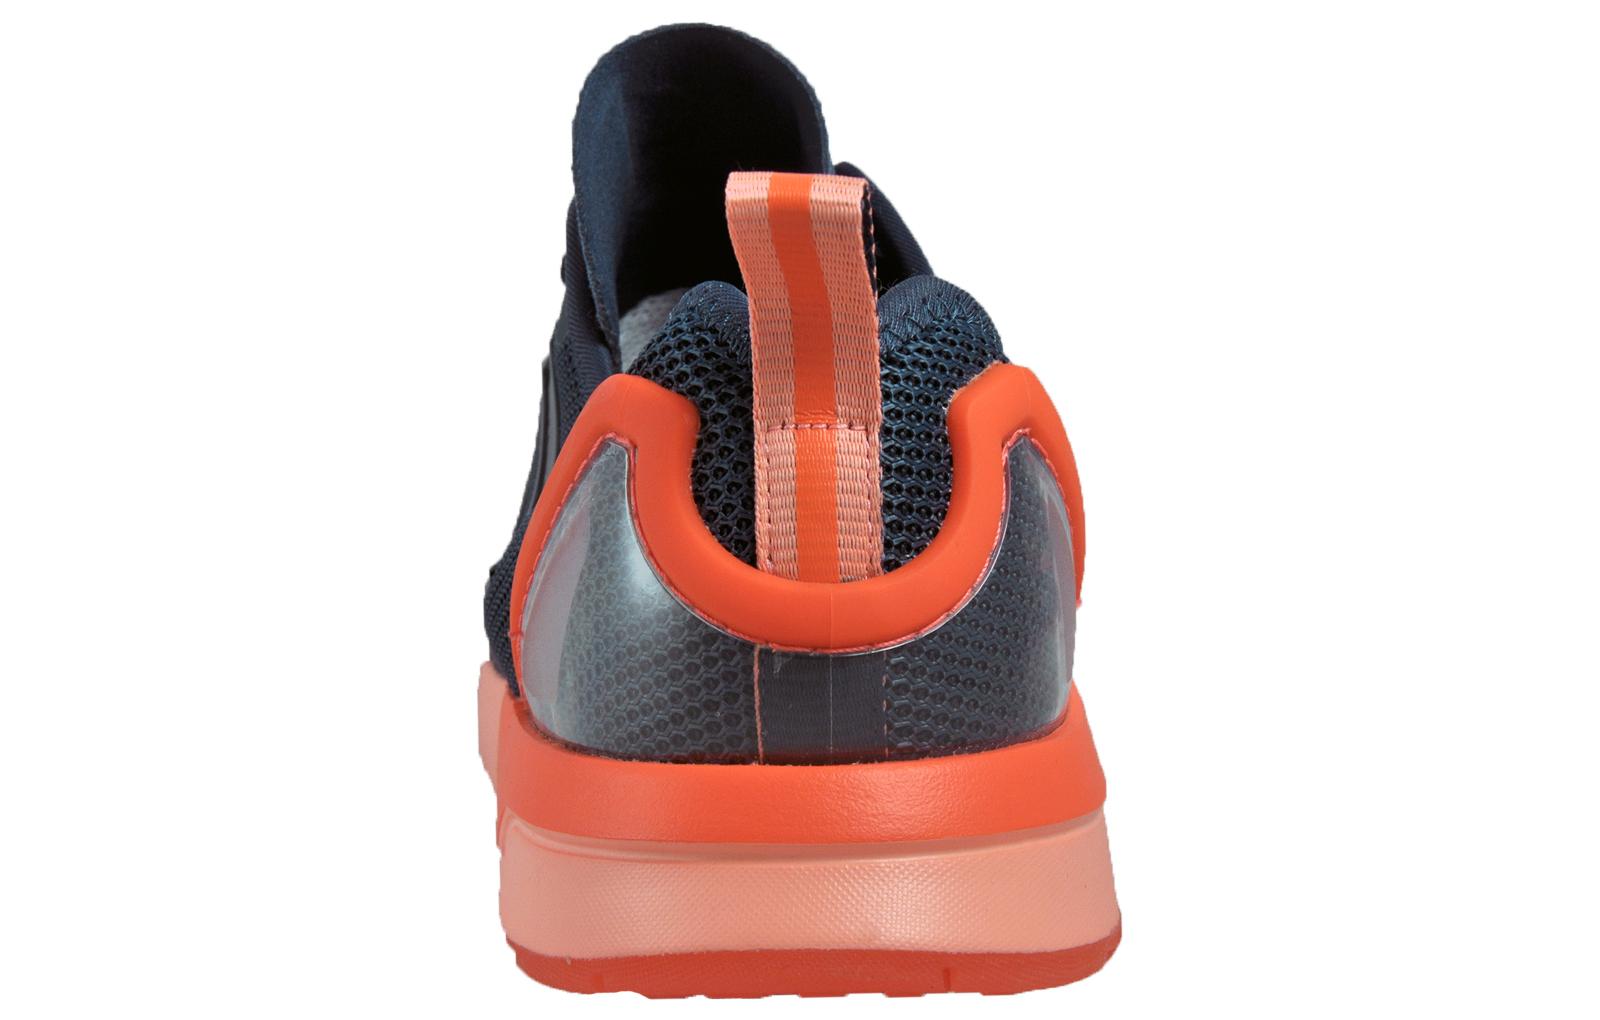 0214c7b9e71c4 Adidas Originals ZX Flux ADV Mens Classic Casual Running Gym Trainers Navy